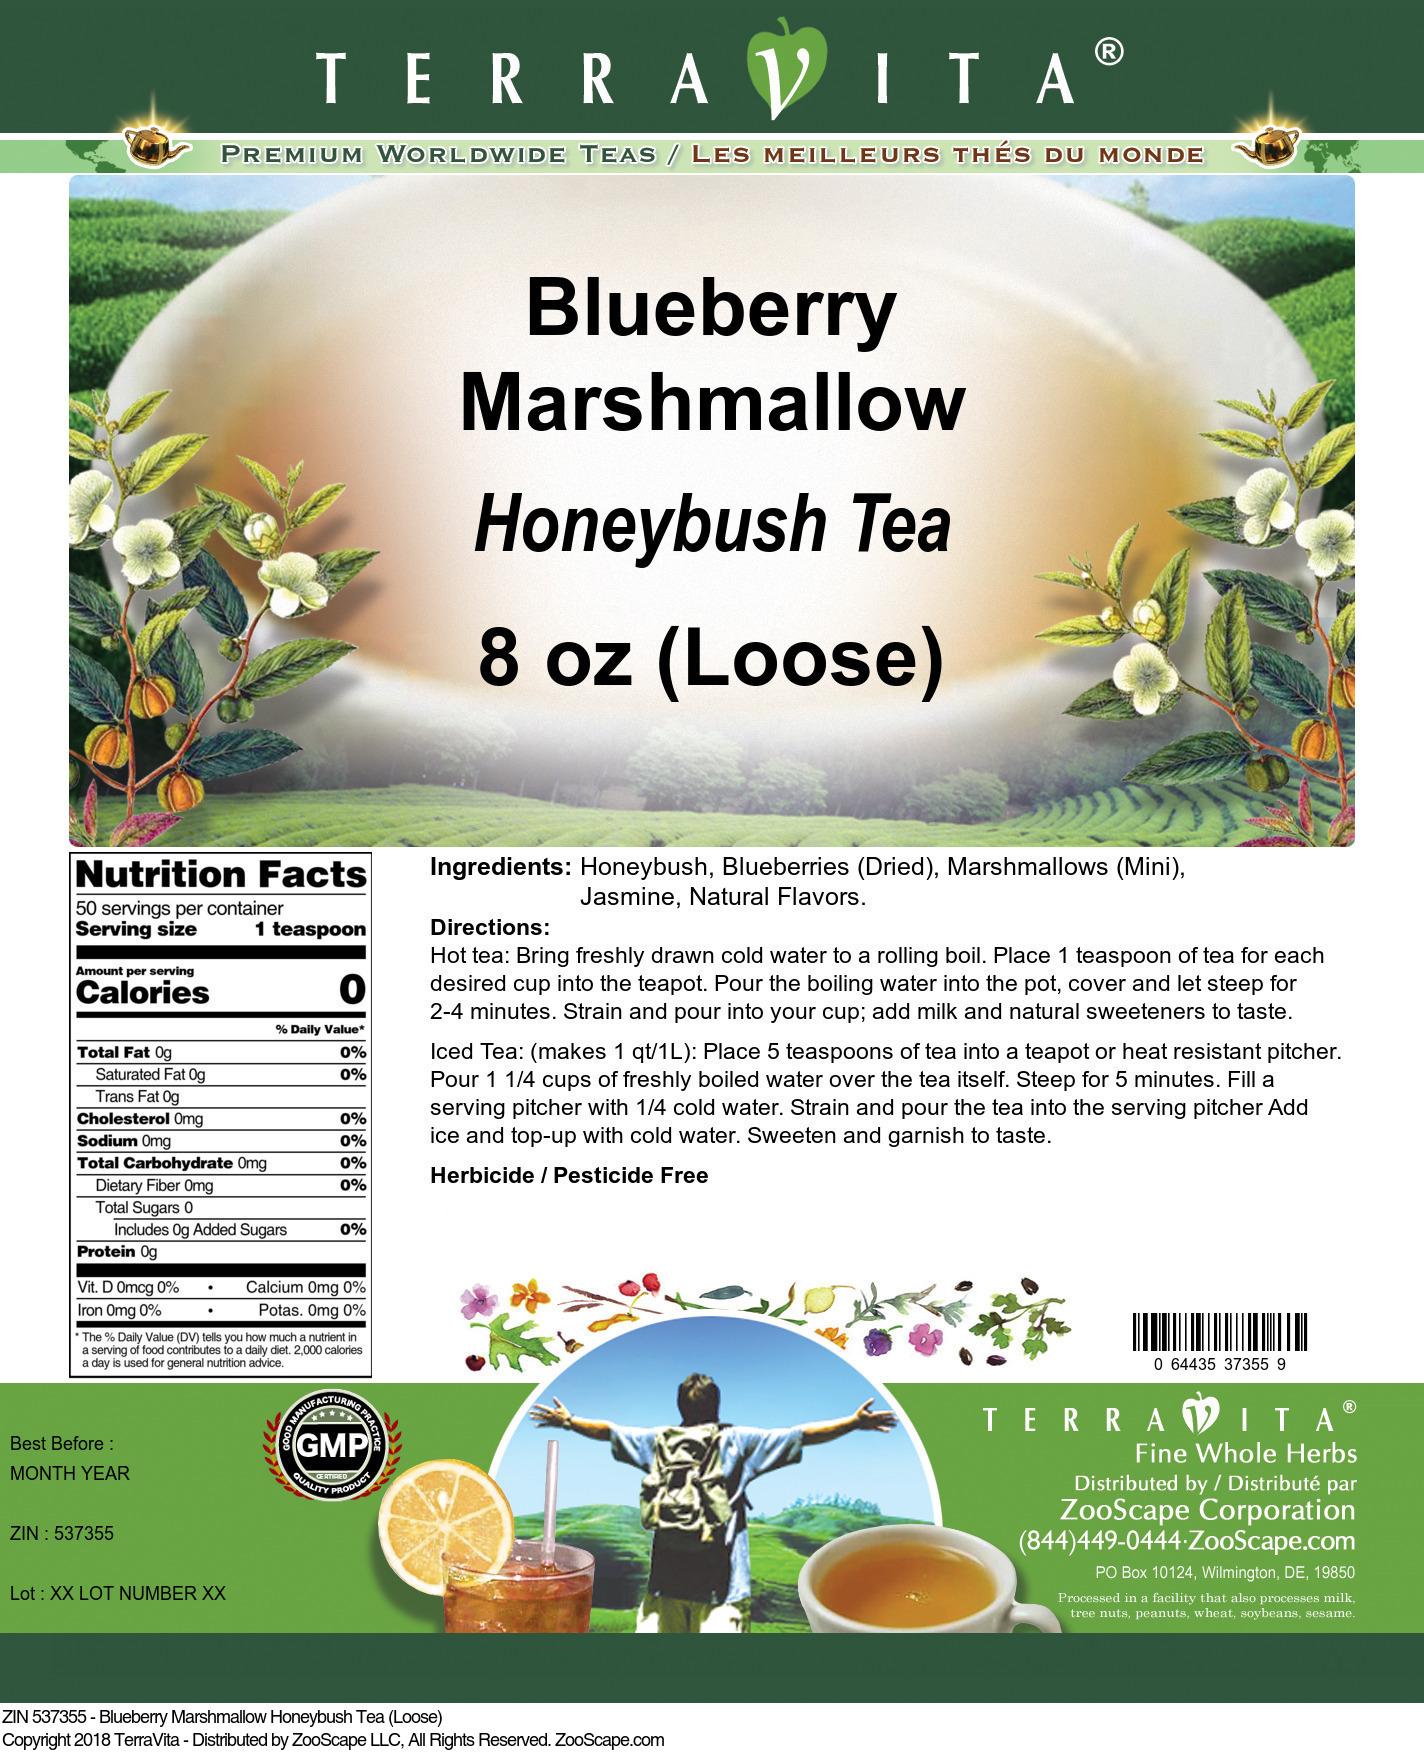 Blueberry Marshmallow Honeybush Tea (Loose)